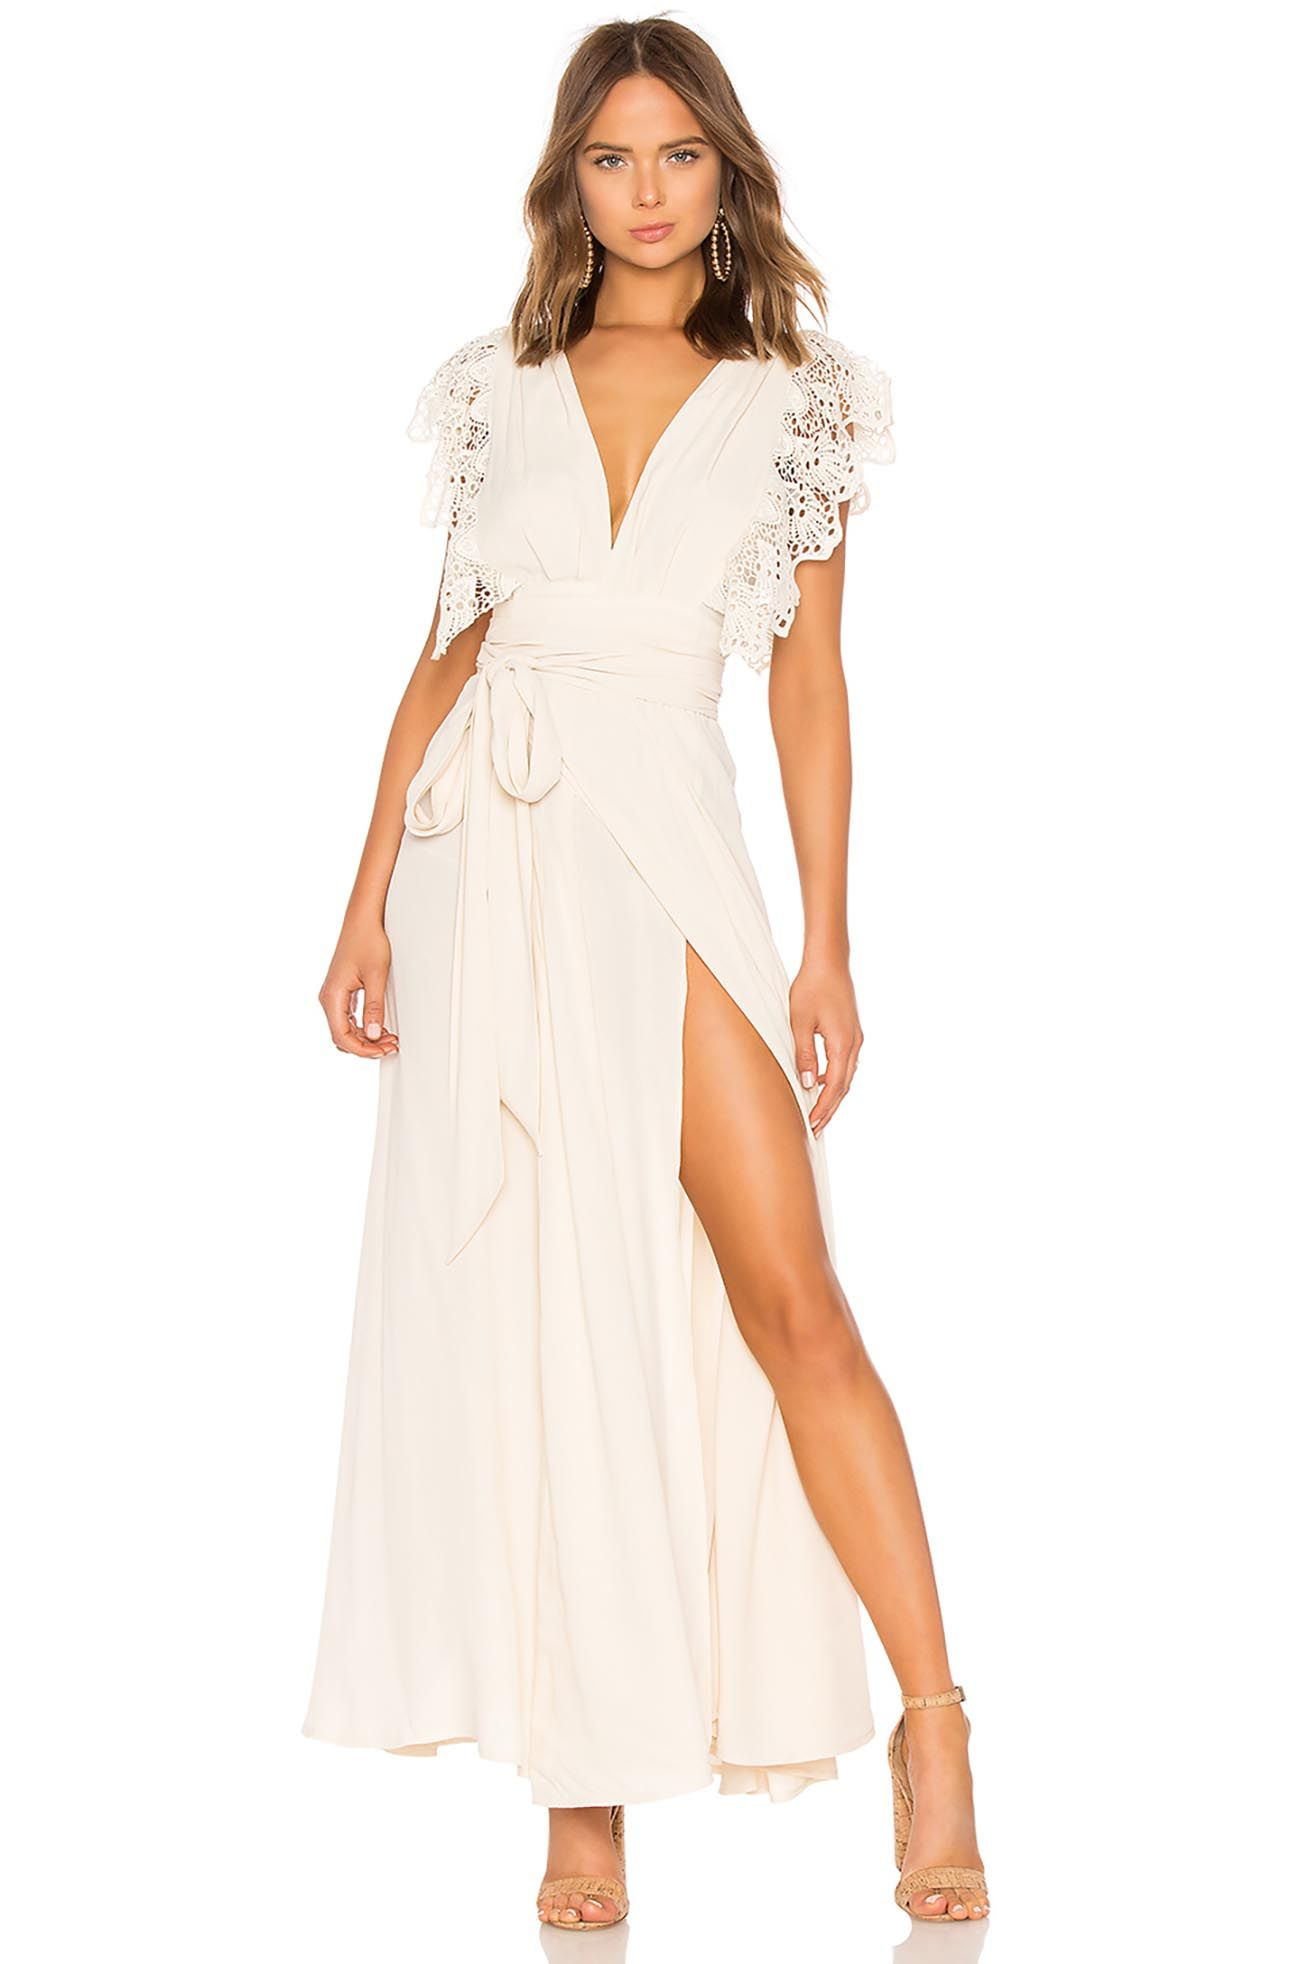 Surf Sand 14 Wedding Dresses For Your Laid Back Beach Wedding